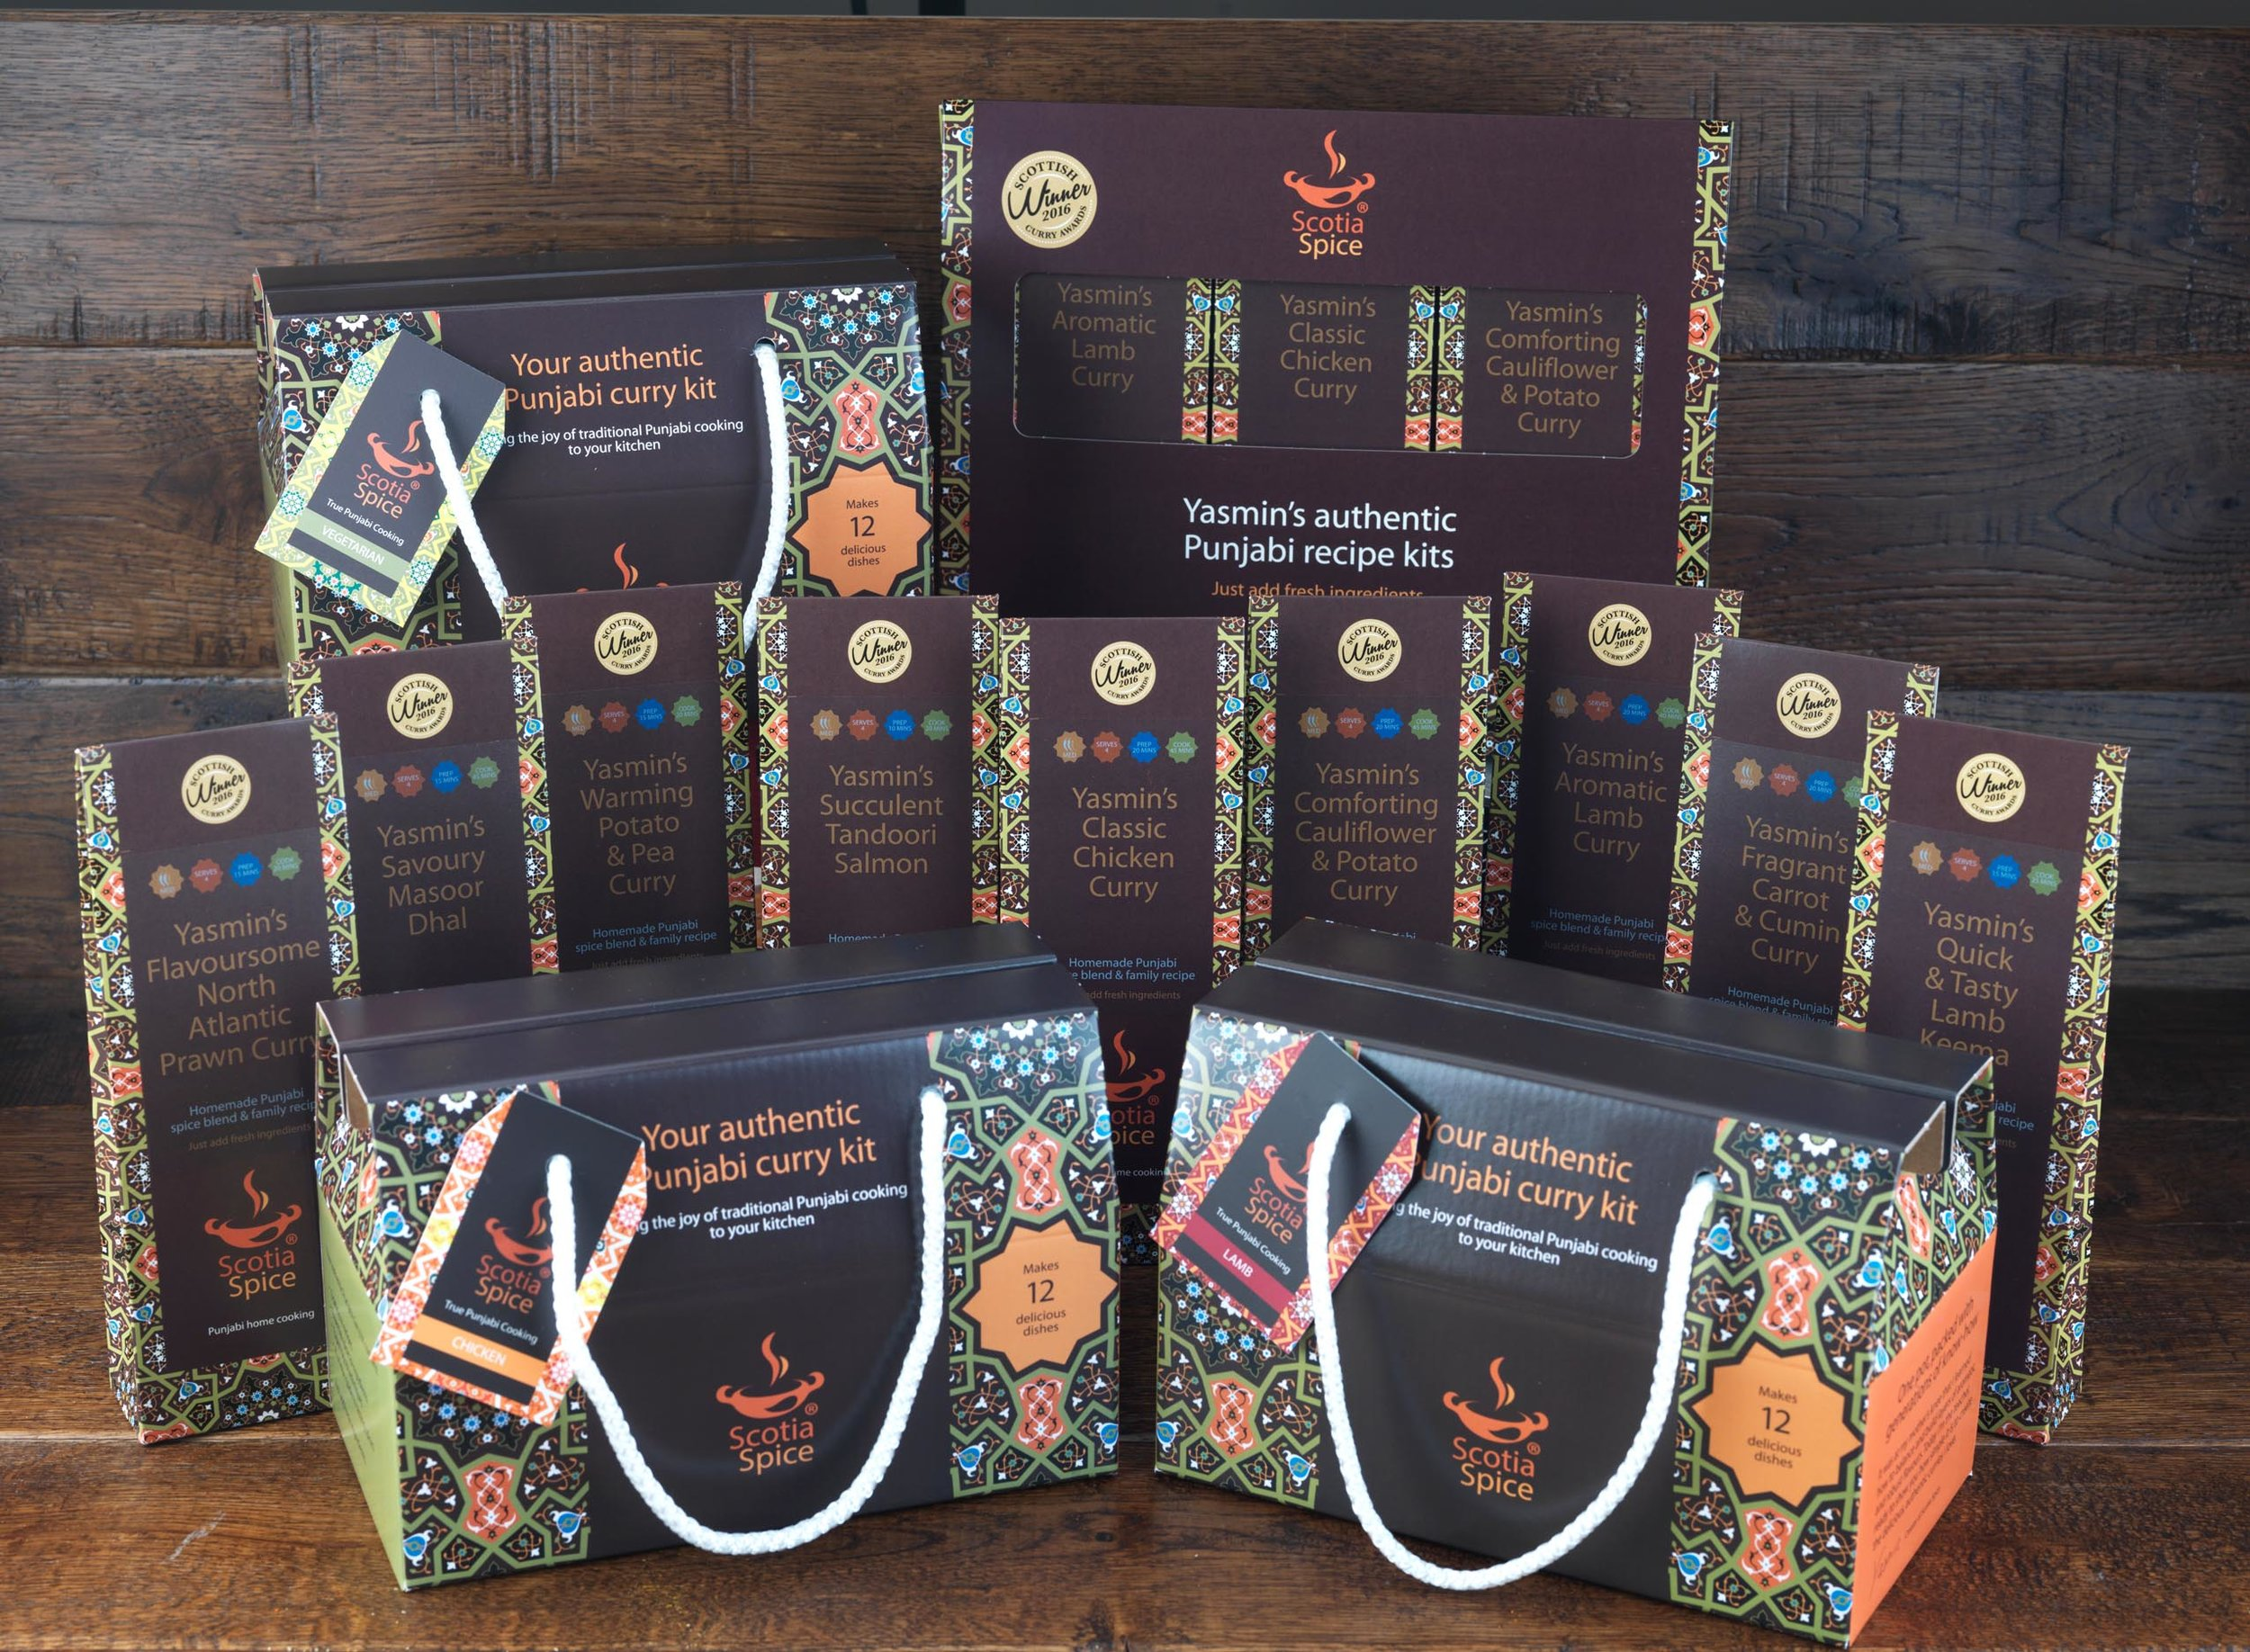 43 Scotia Spice product range.jpg